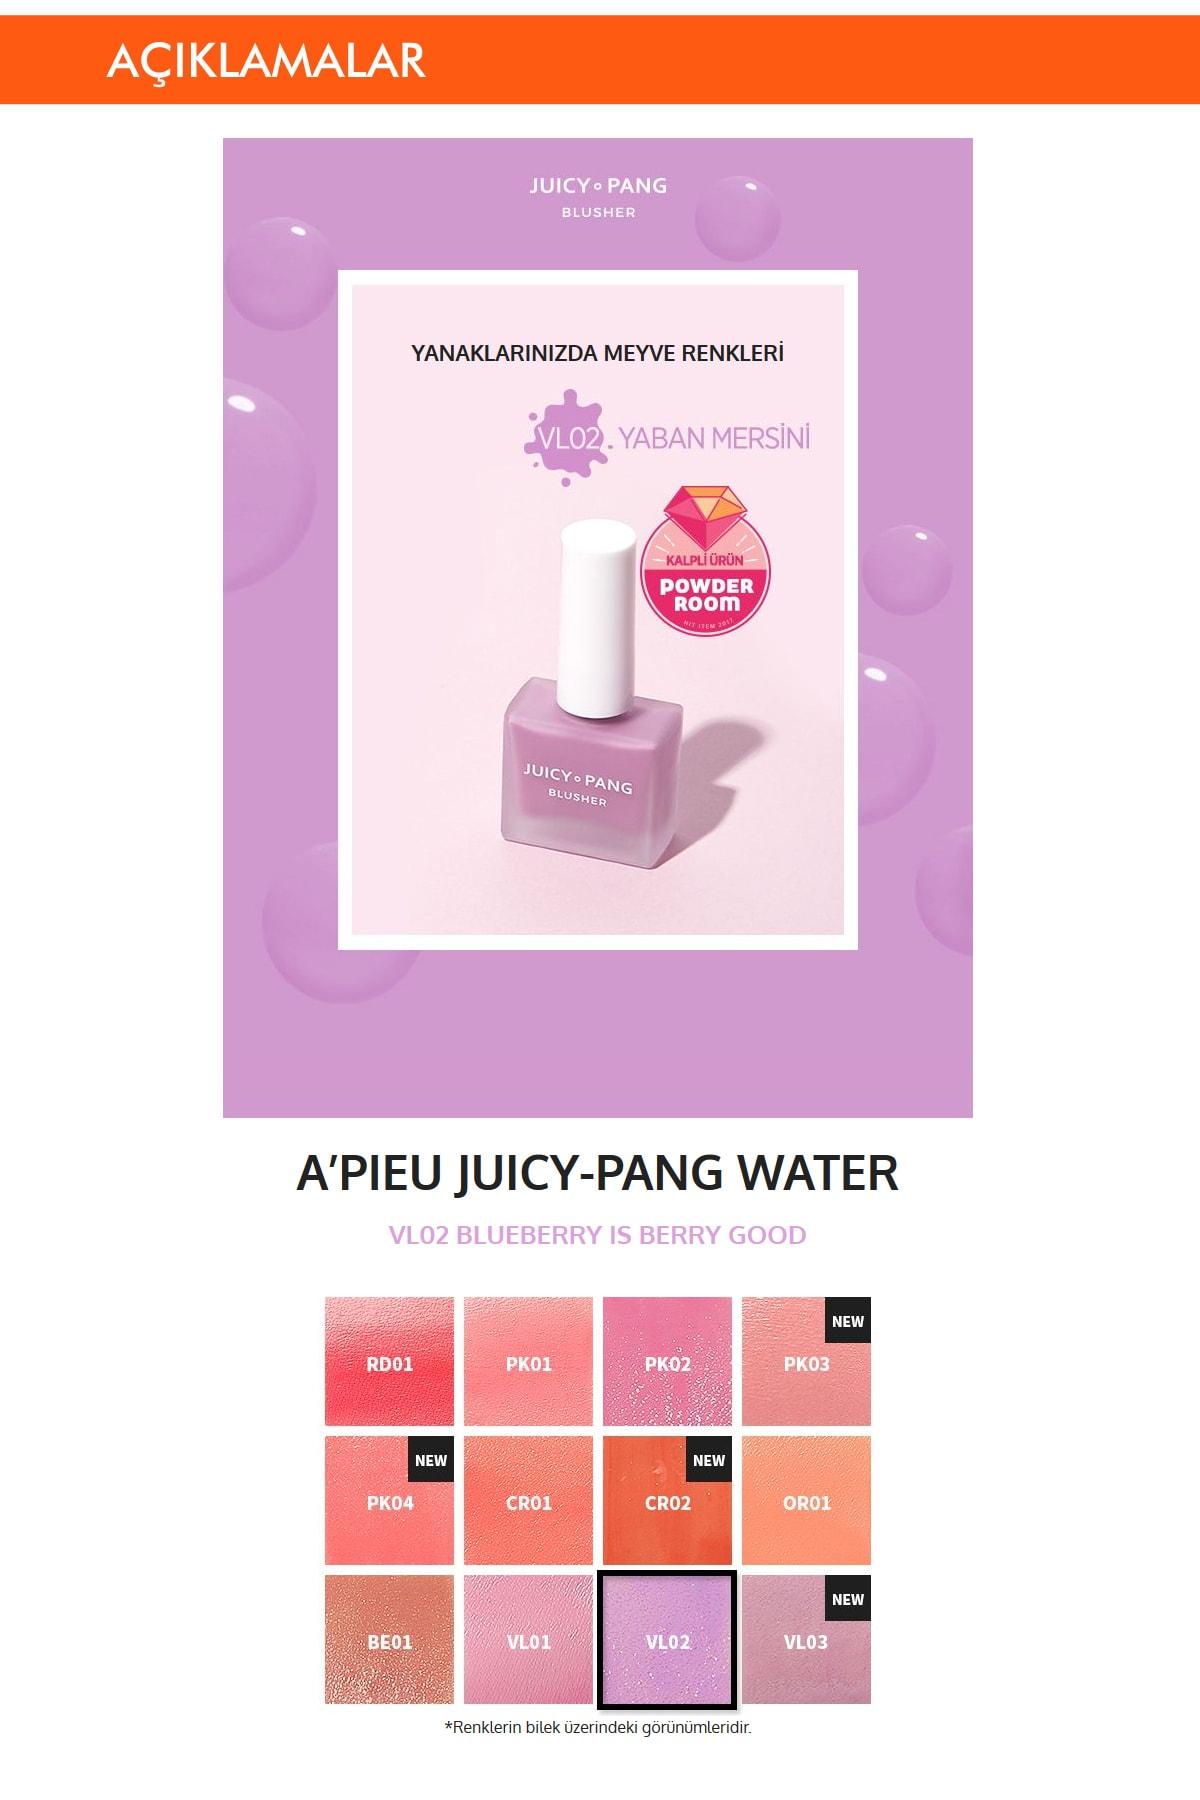 Missha Doğal Görünüm Sunan Nemlendirici Likit Allık 9g. APIEU Juicy-Pang Water Blusher (VL02) 1